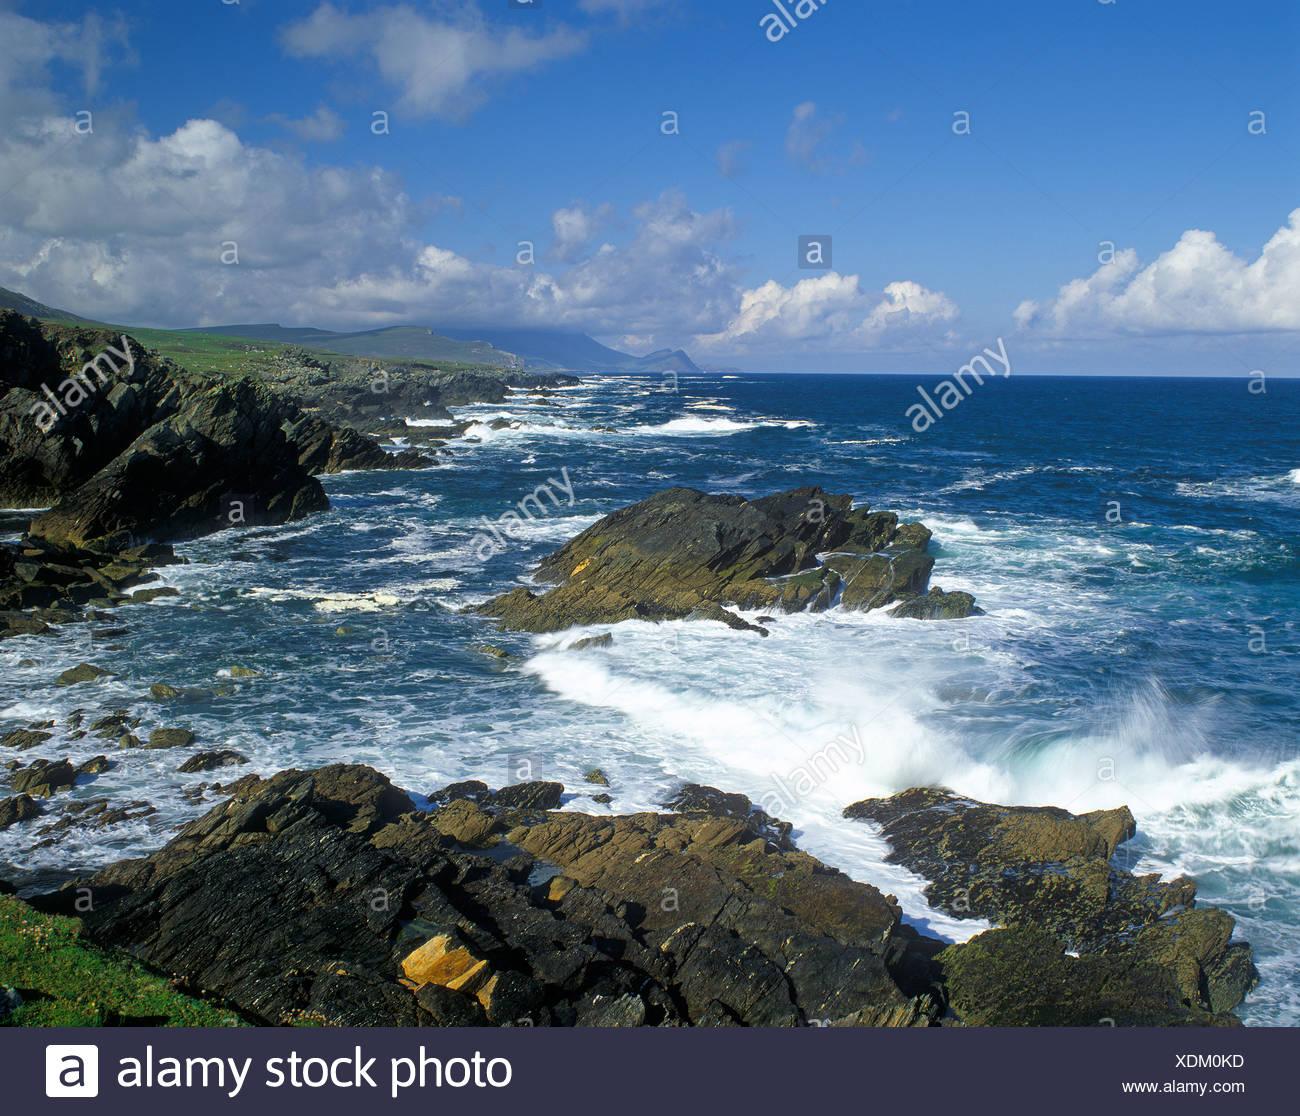 Coast, Slieve More, Atlantic Drive, County Mayo, Republic of Ireland, Europe - Stock Image